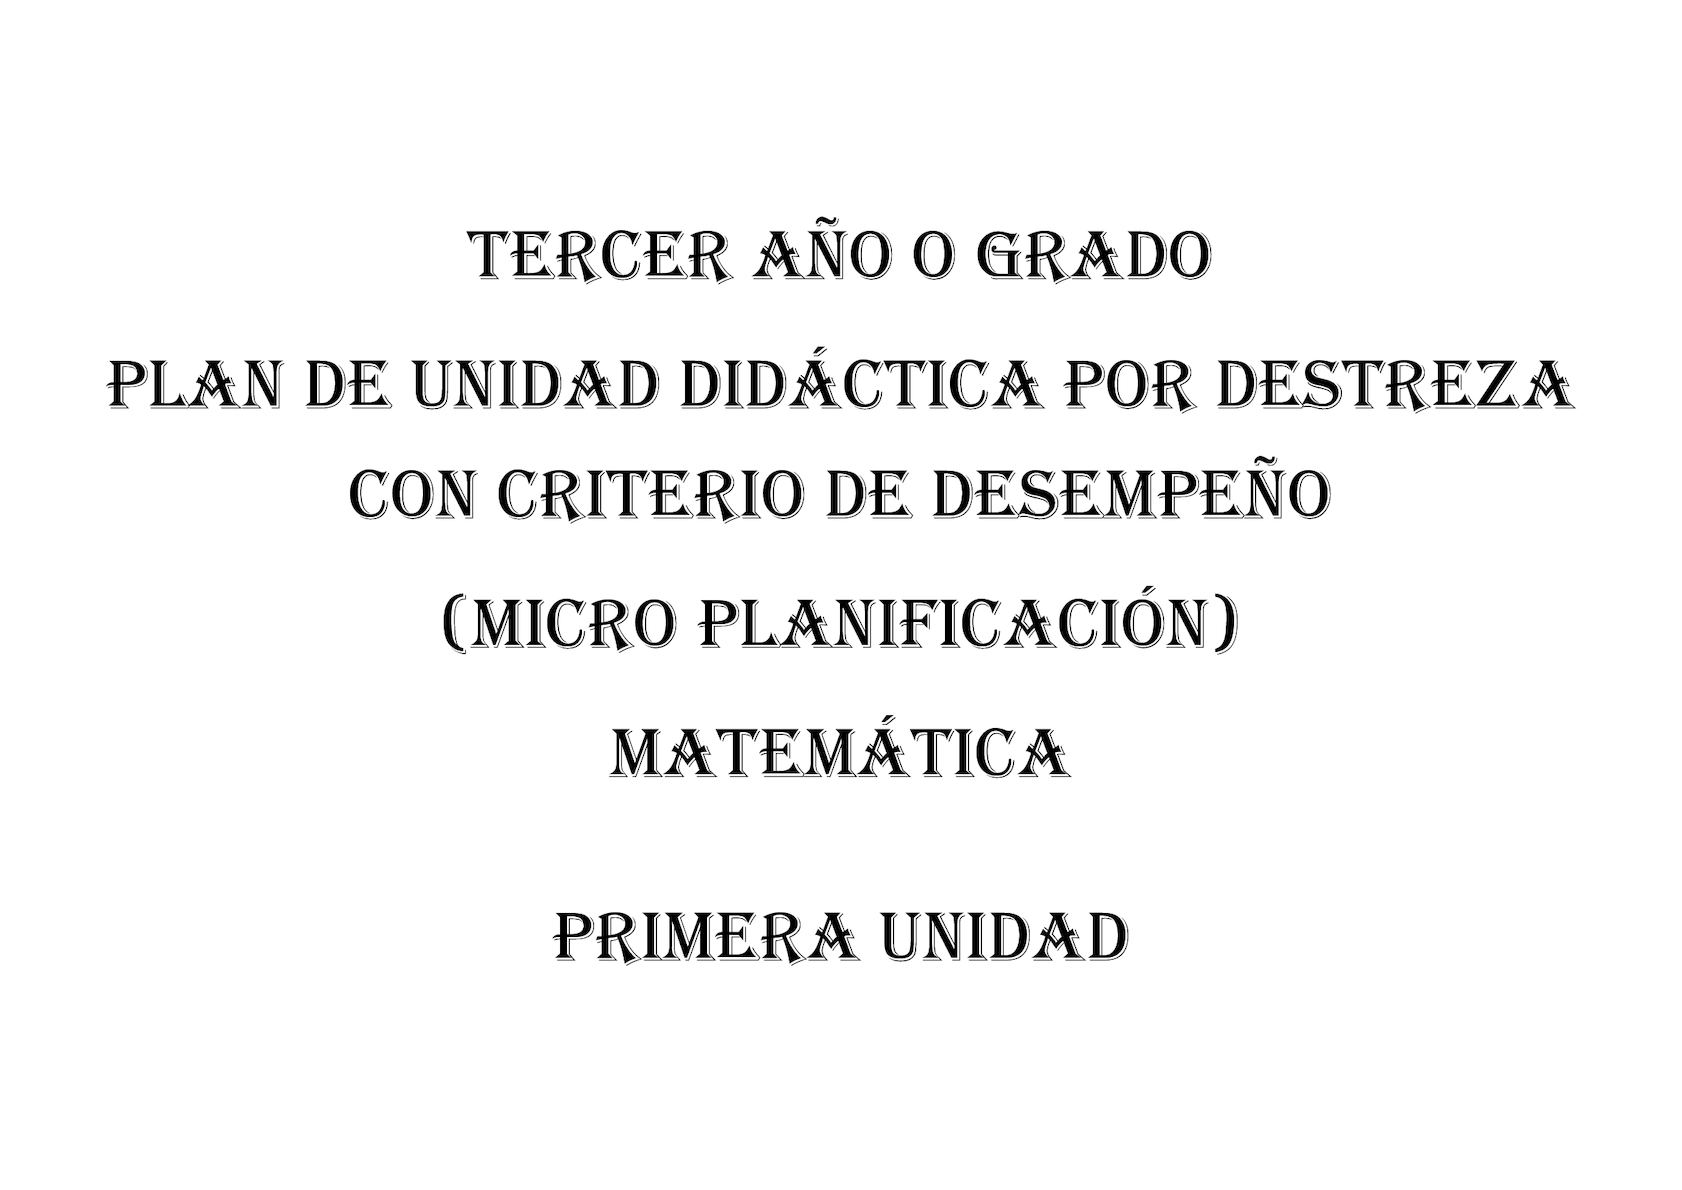 Pud Matematica Tercer Año